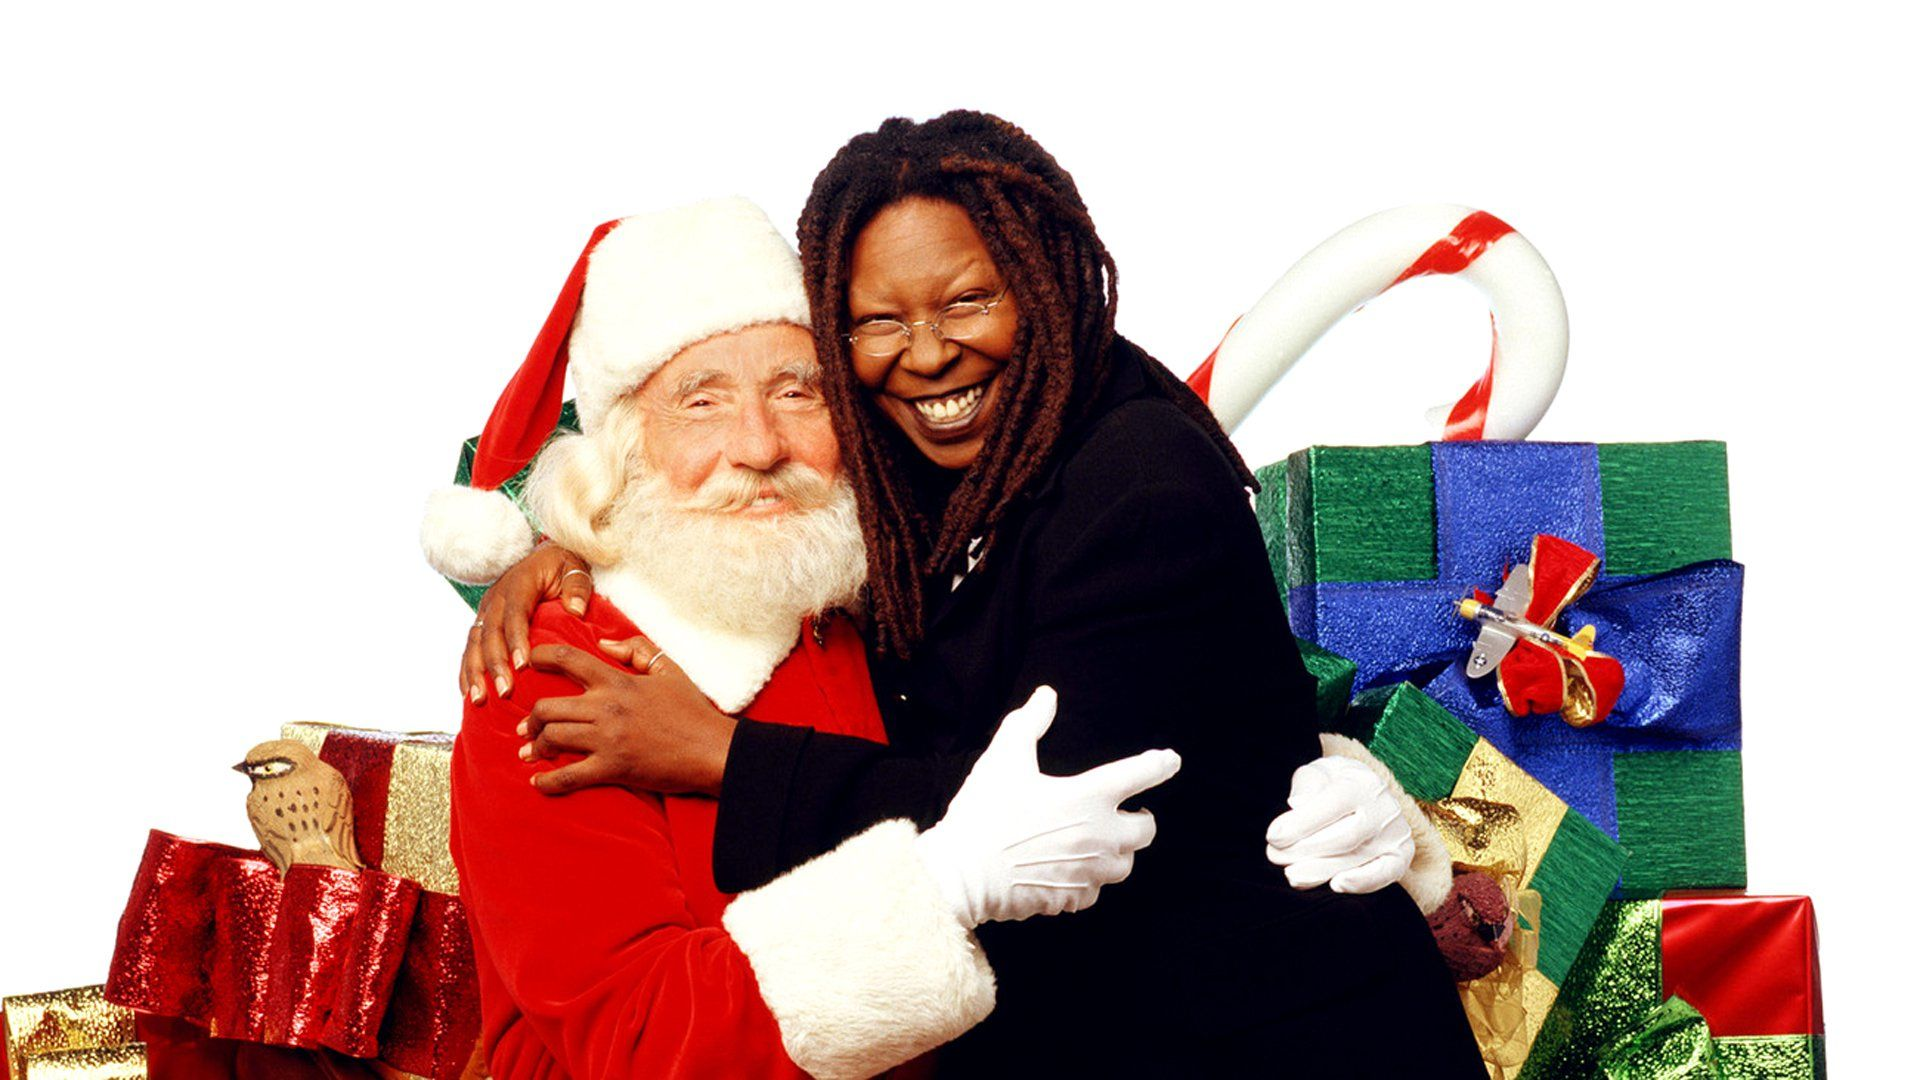 Crítica | Pode Me Chamar de Noel (Call Me Claus) – Host Geek